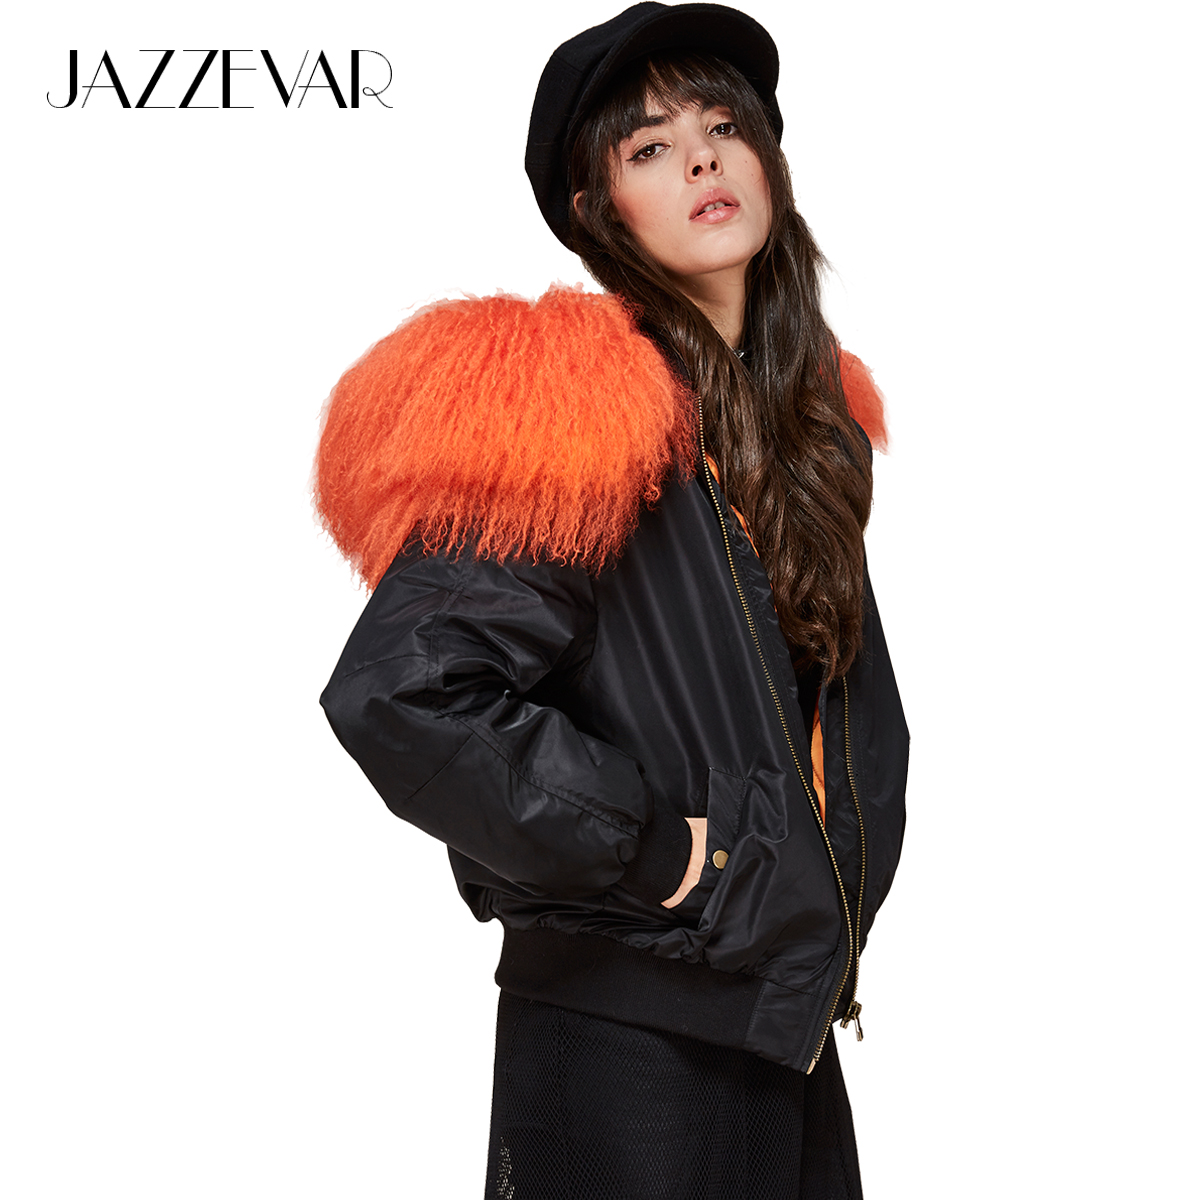 JAZZEVAR 2019 New winter fashion street woman hooded bomber jacket mongolia sheep fur collar short basic